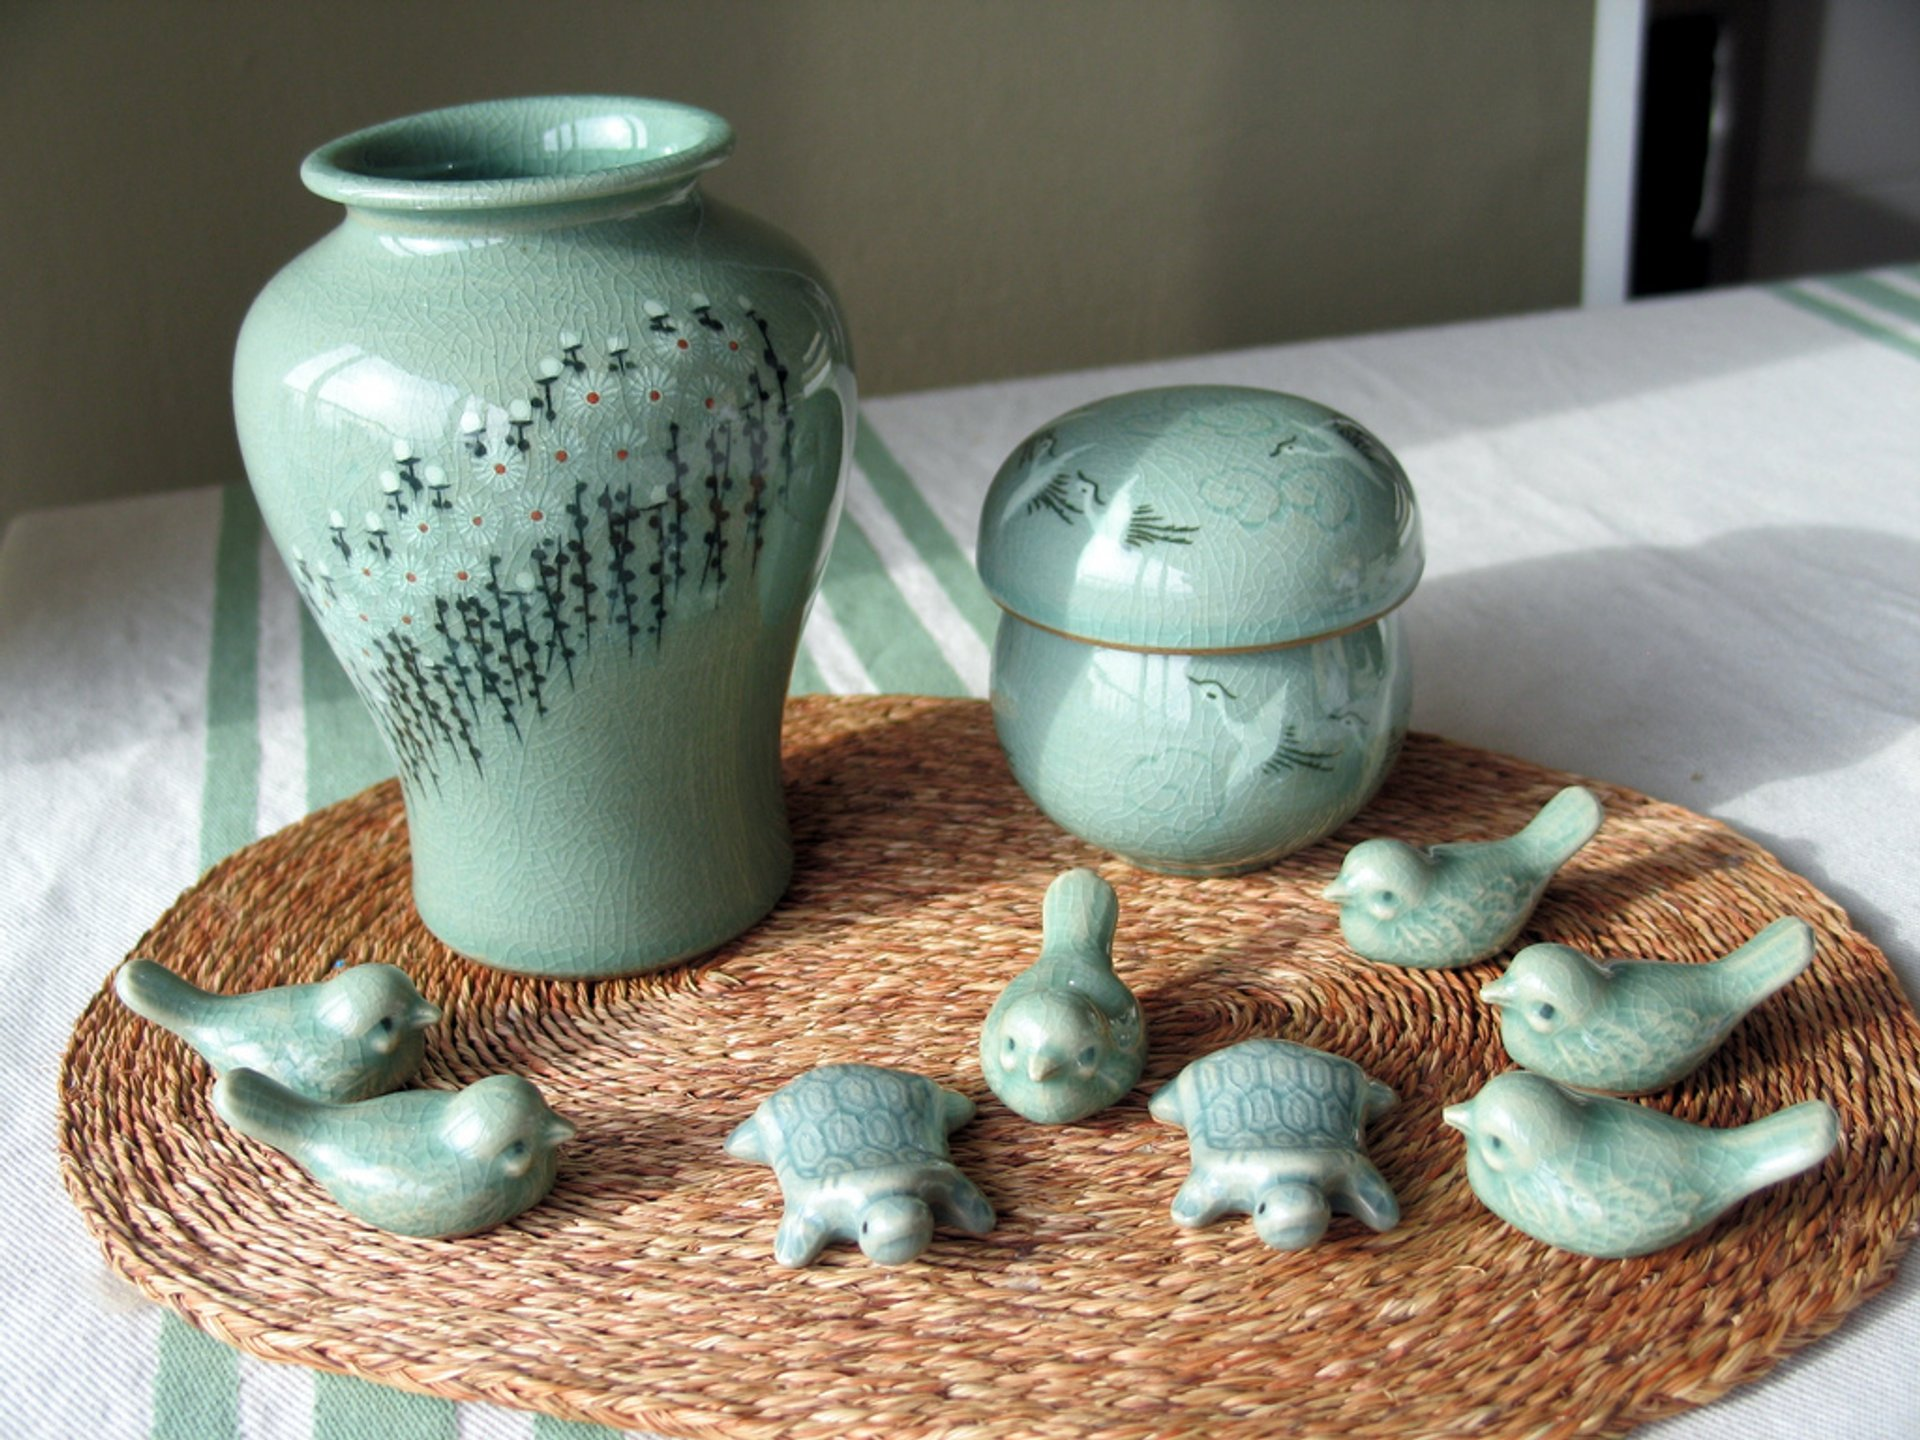 Icheon ceramics 2020